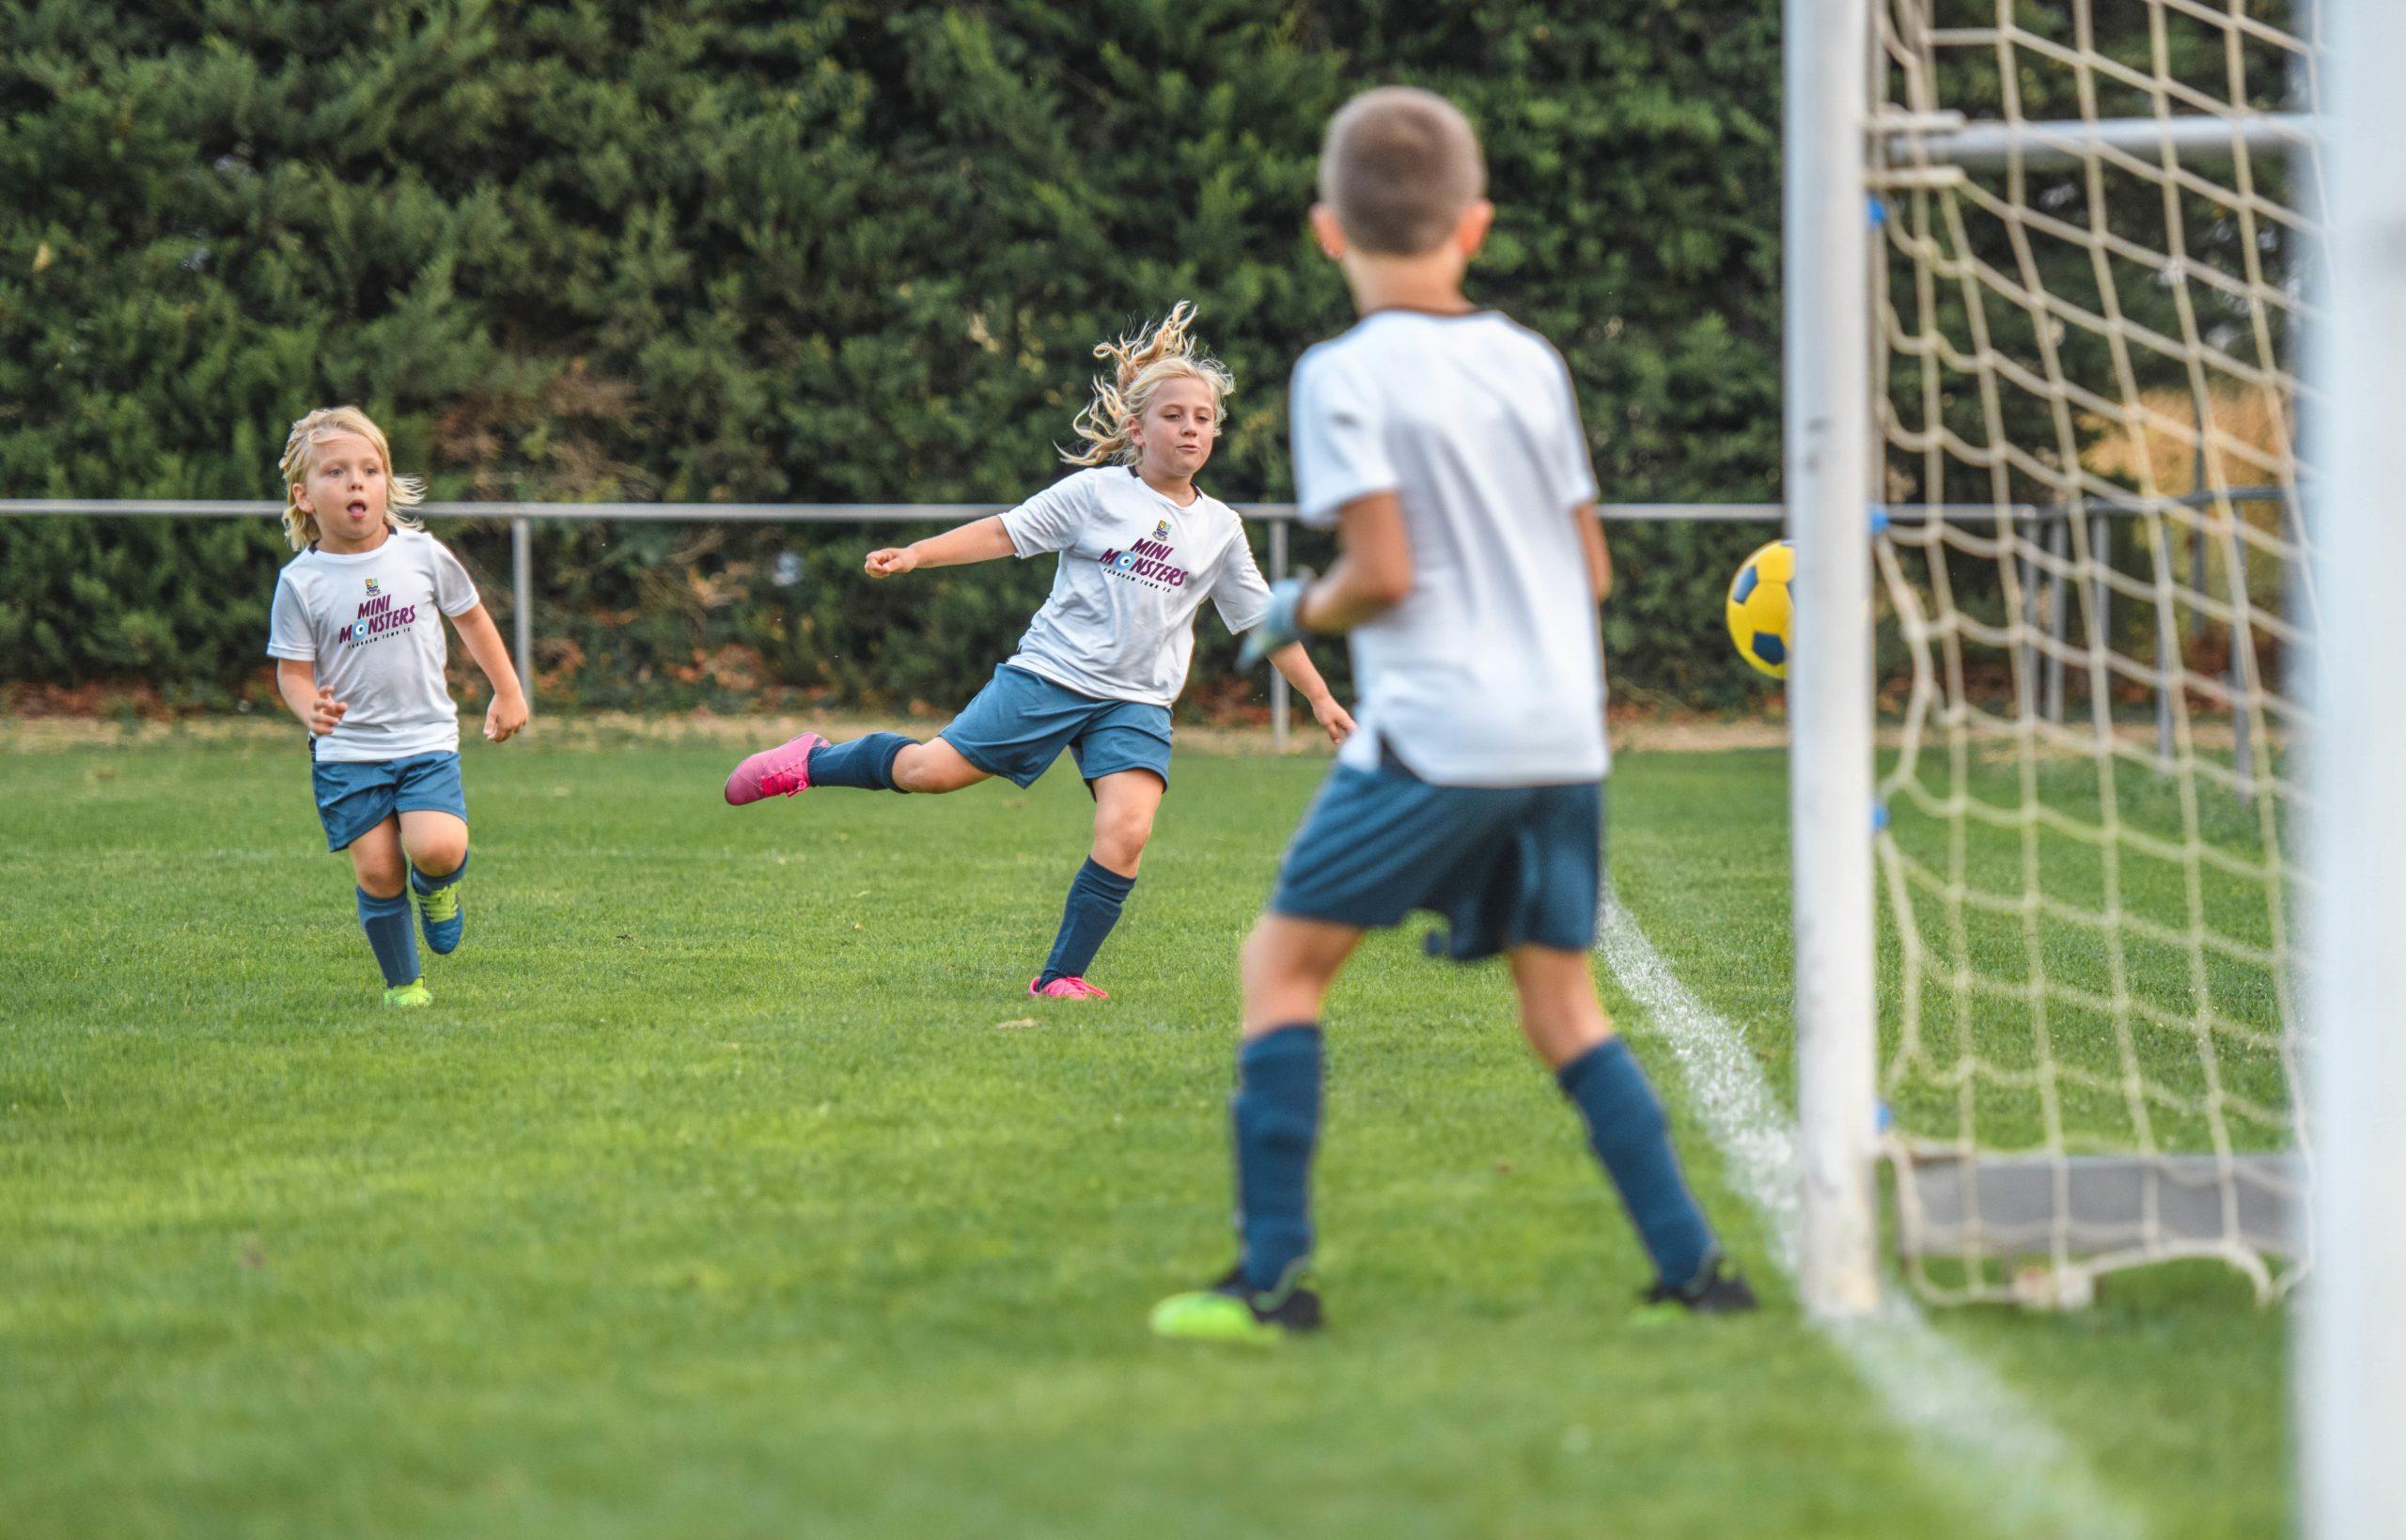 Childrens Football in Farnham